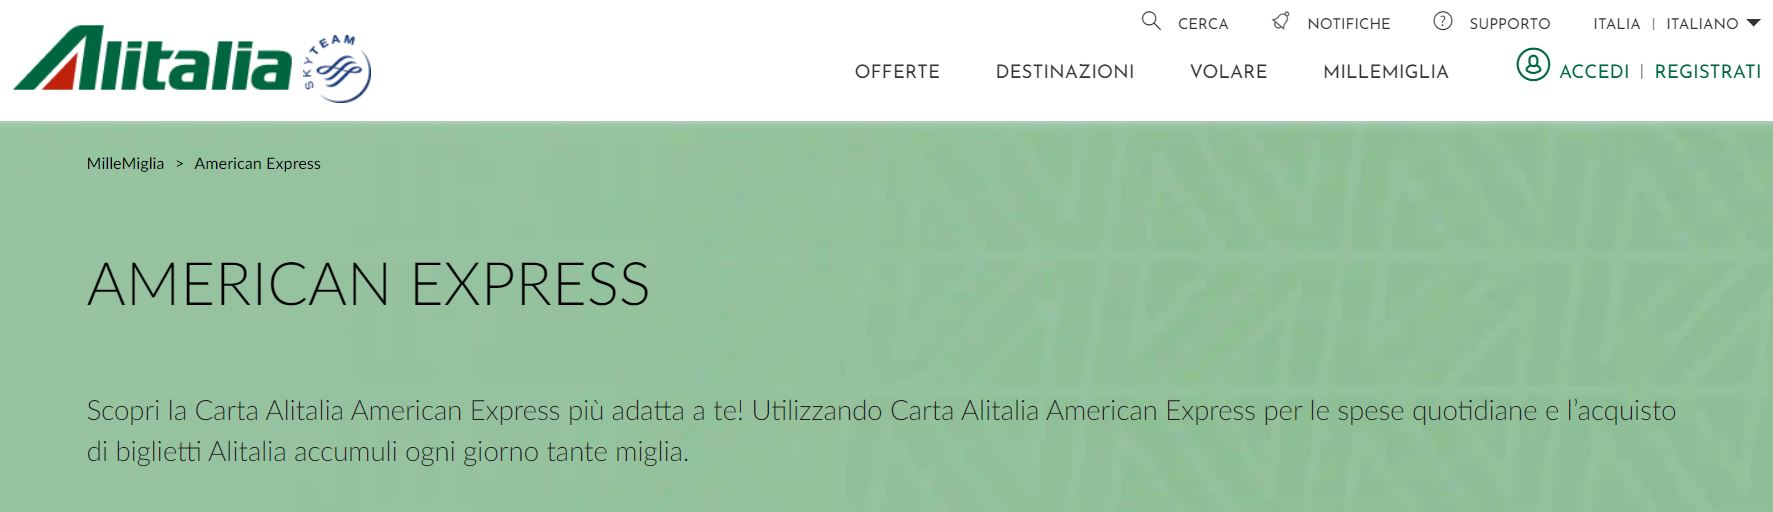 alitalia american express